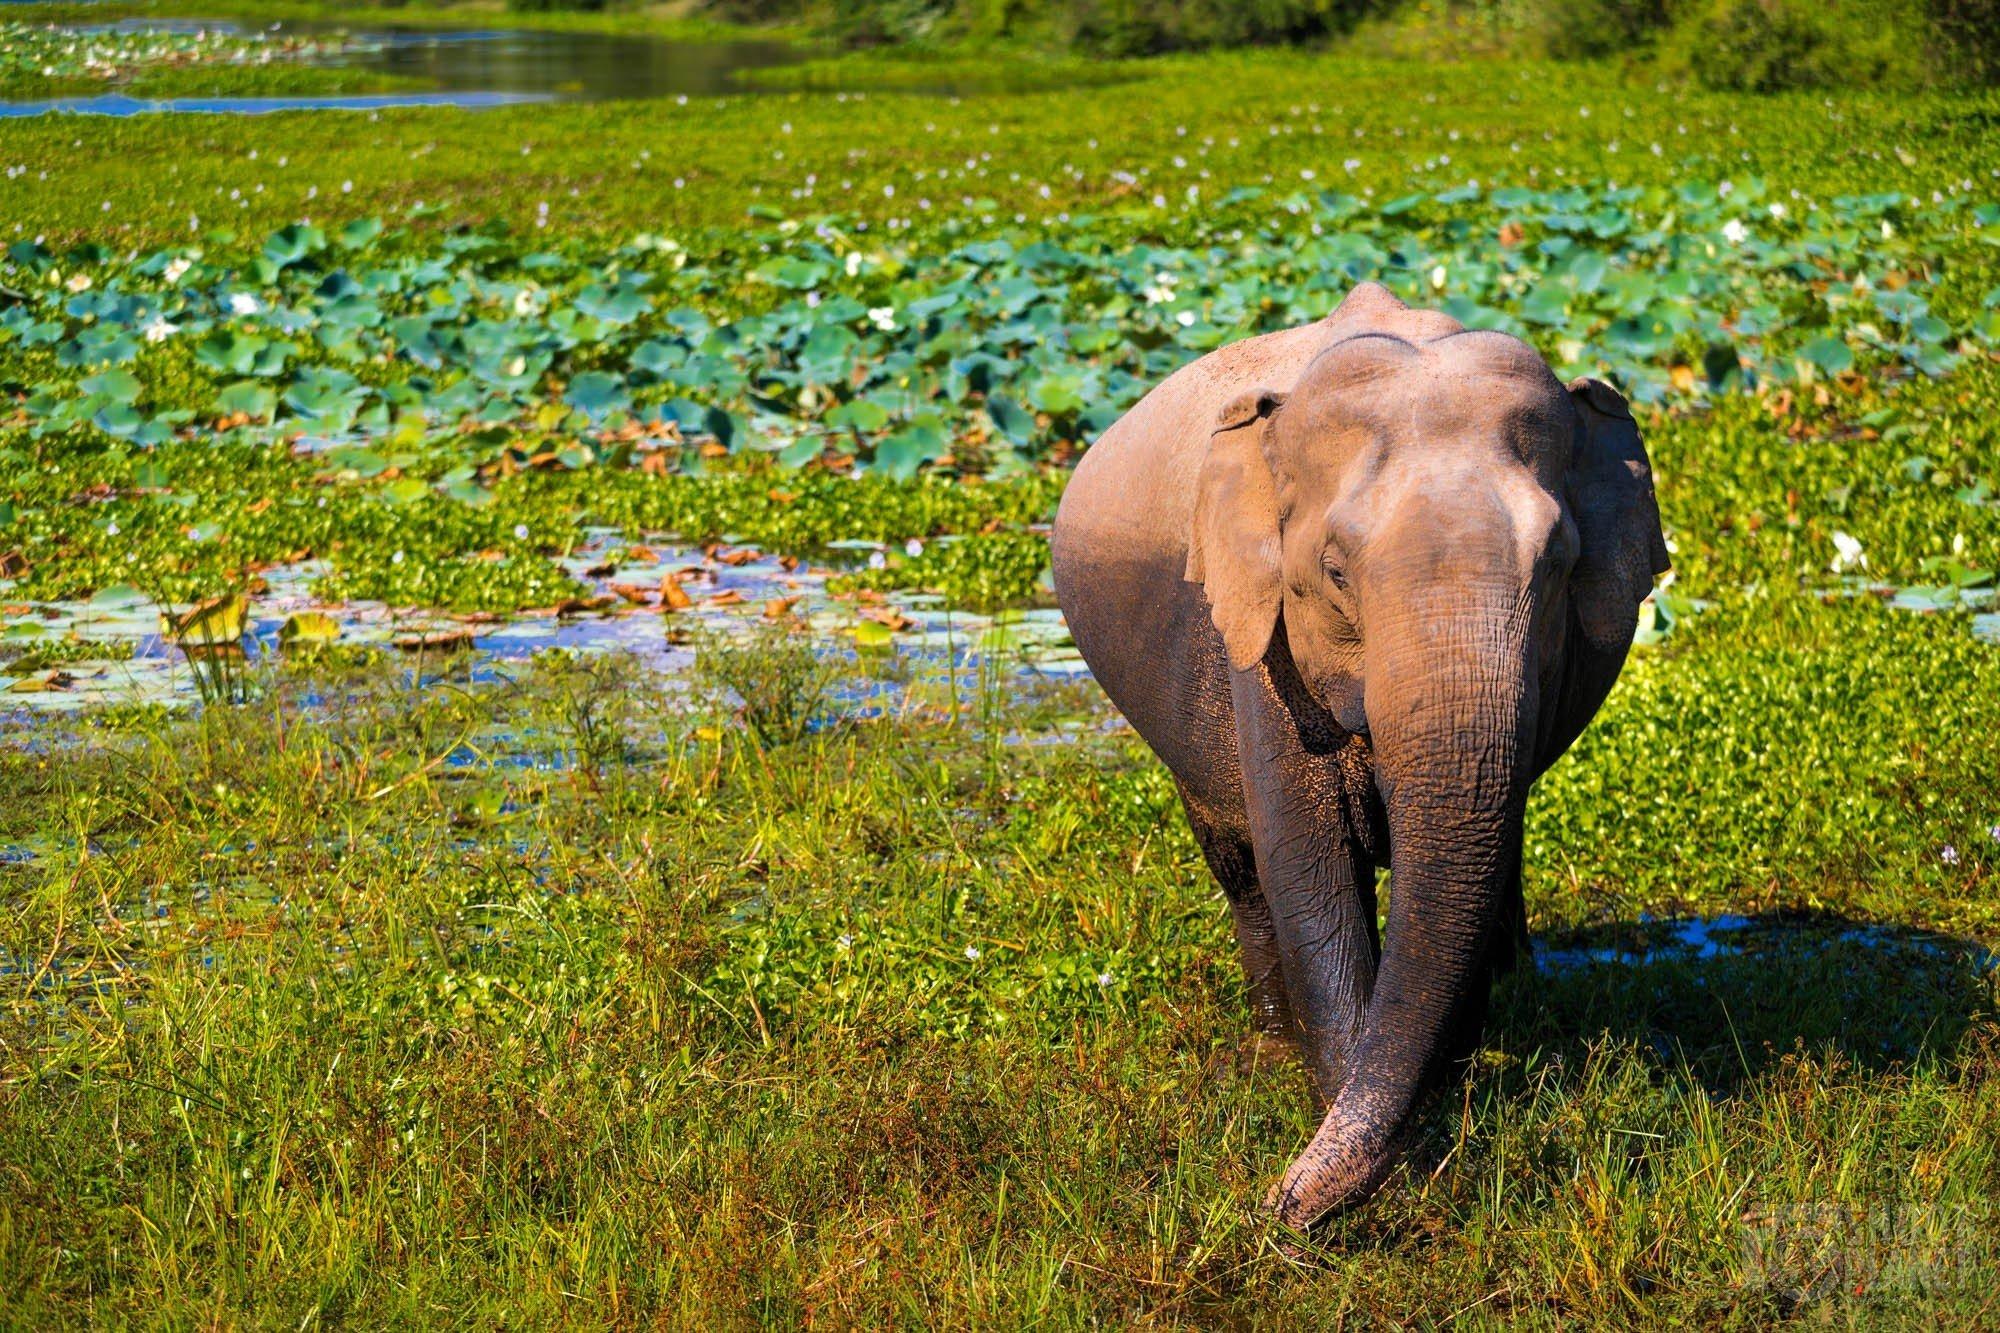 Elephant in Yala jungle lake, Sri Lanka